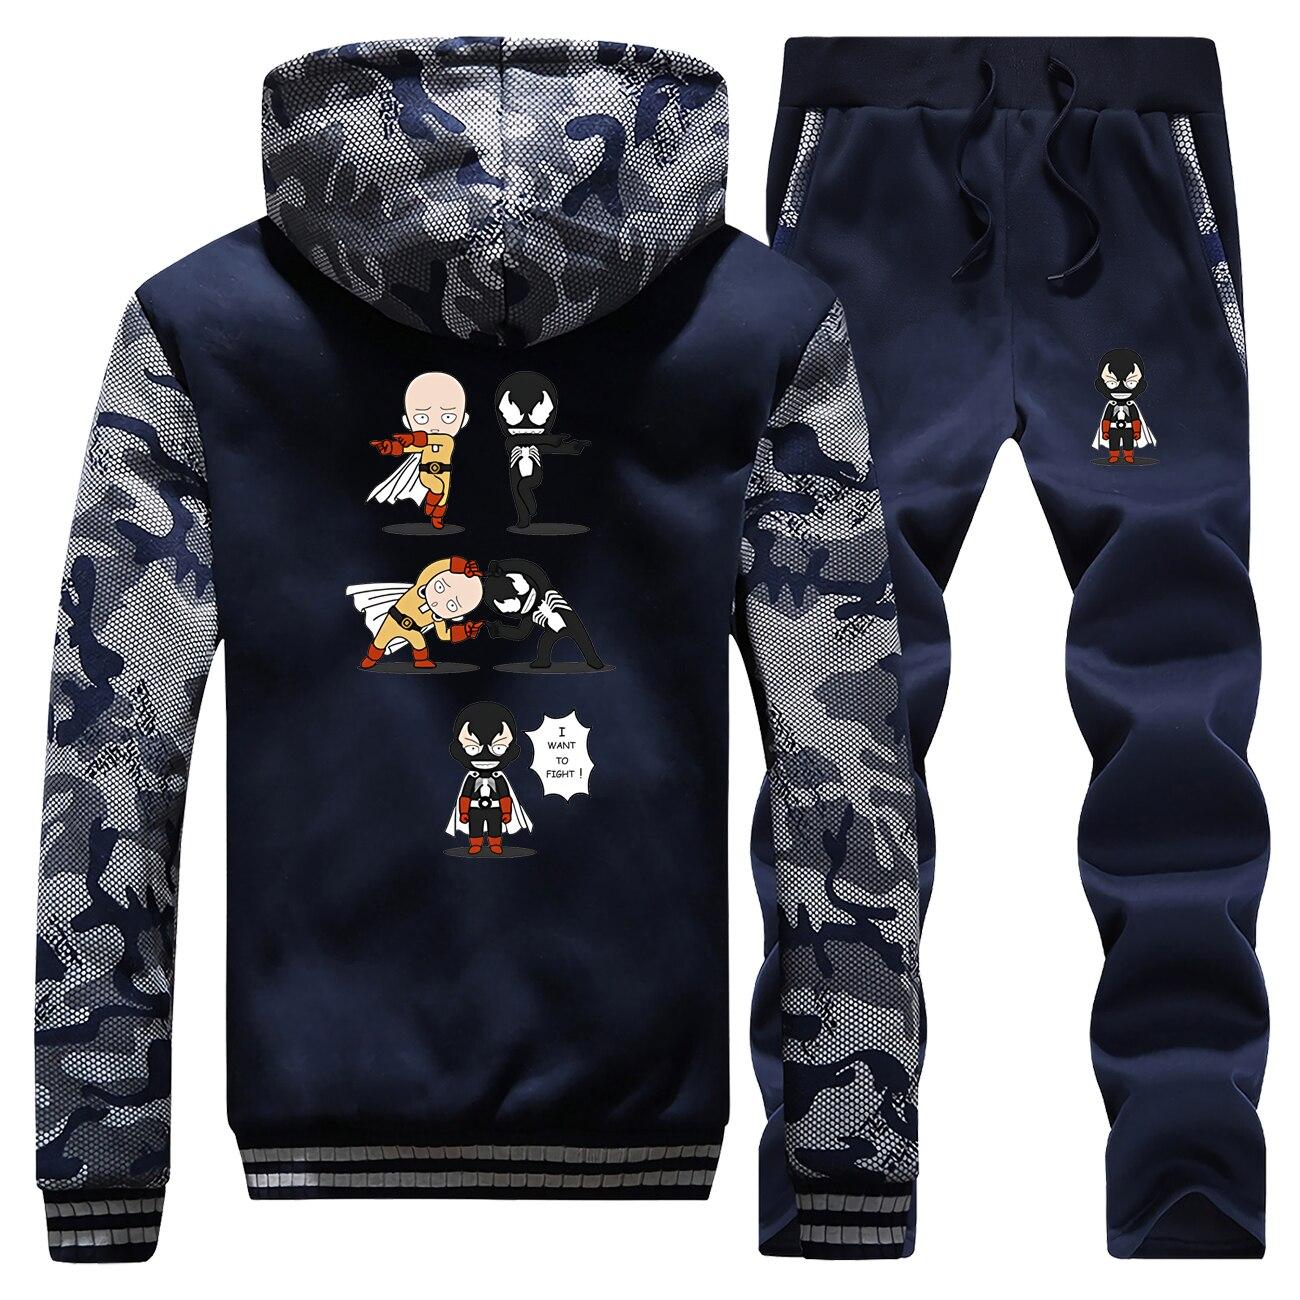 One Punch Man Venom Edward Brock Tracksuits Jacket Pant Set Men Funny Sportsuit Sweatshirts Sets Suit 2 PCS Camo Coat Sportswear